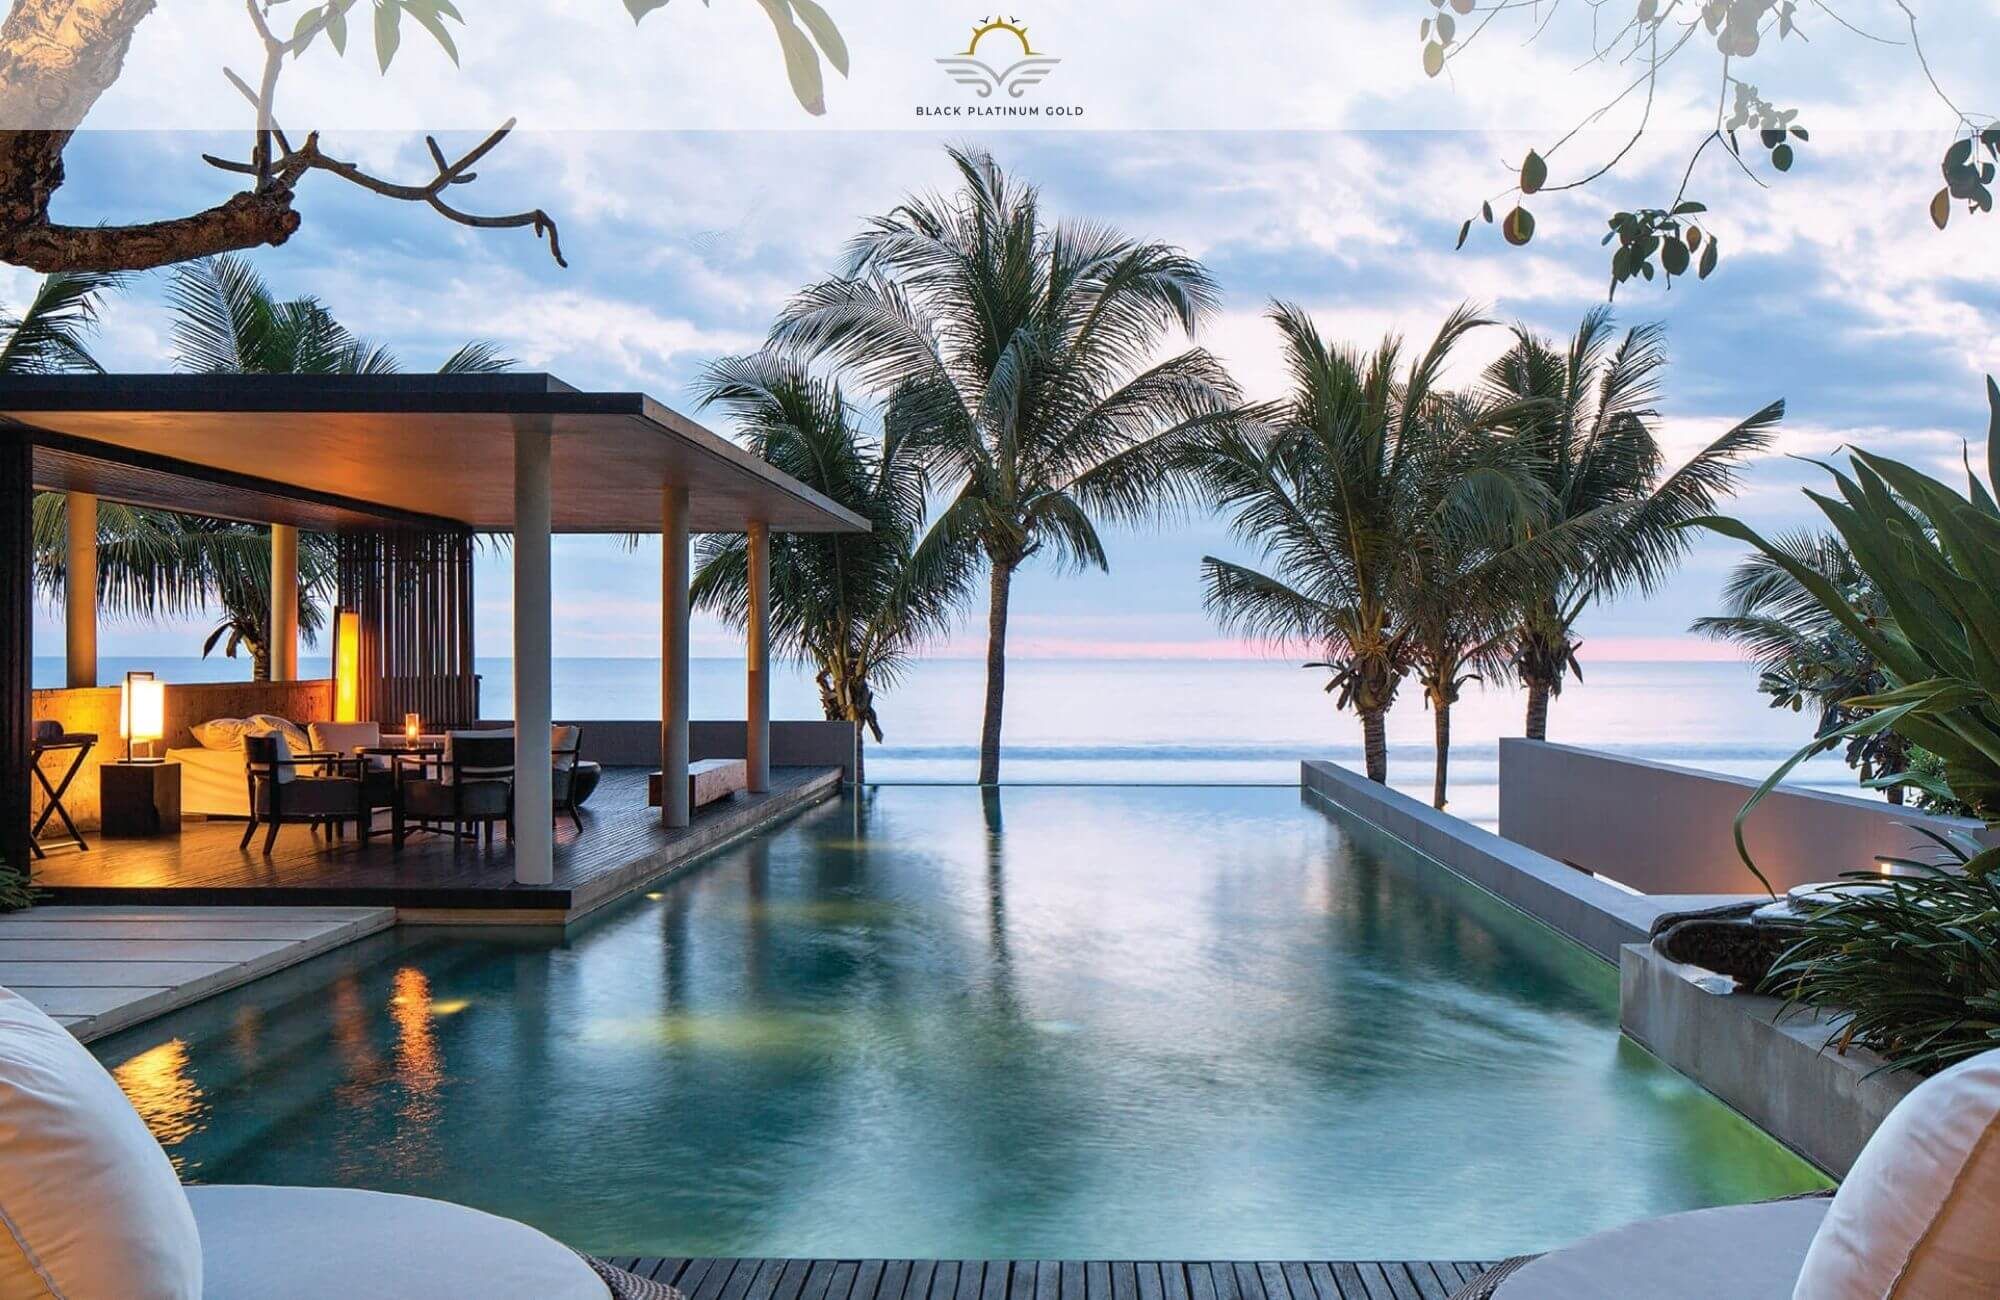 Bali, Indonesia – 3 Nights at Soori Bali, Ocean Pool Villa